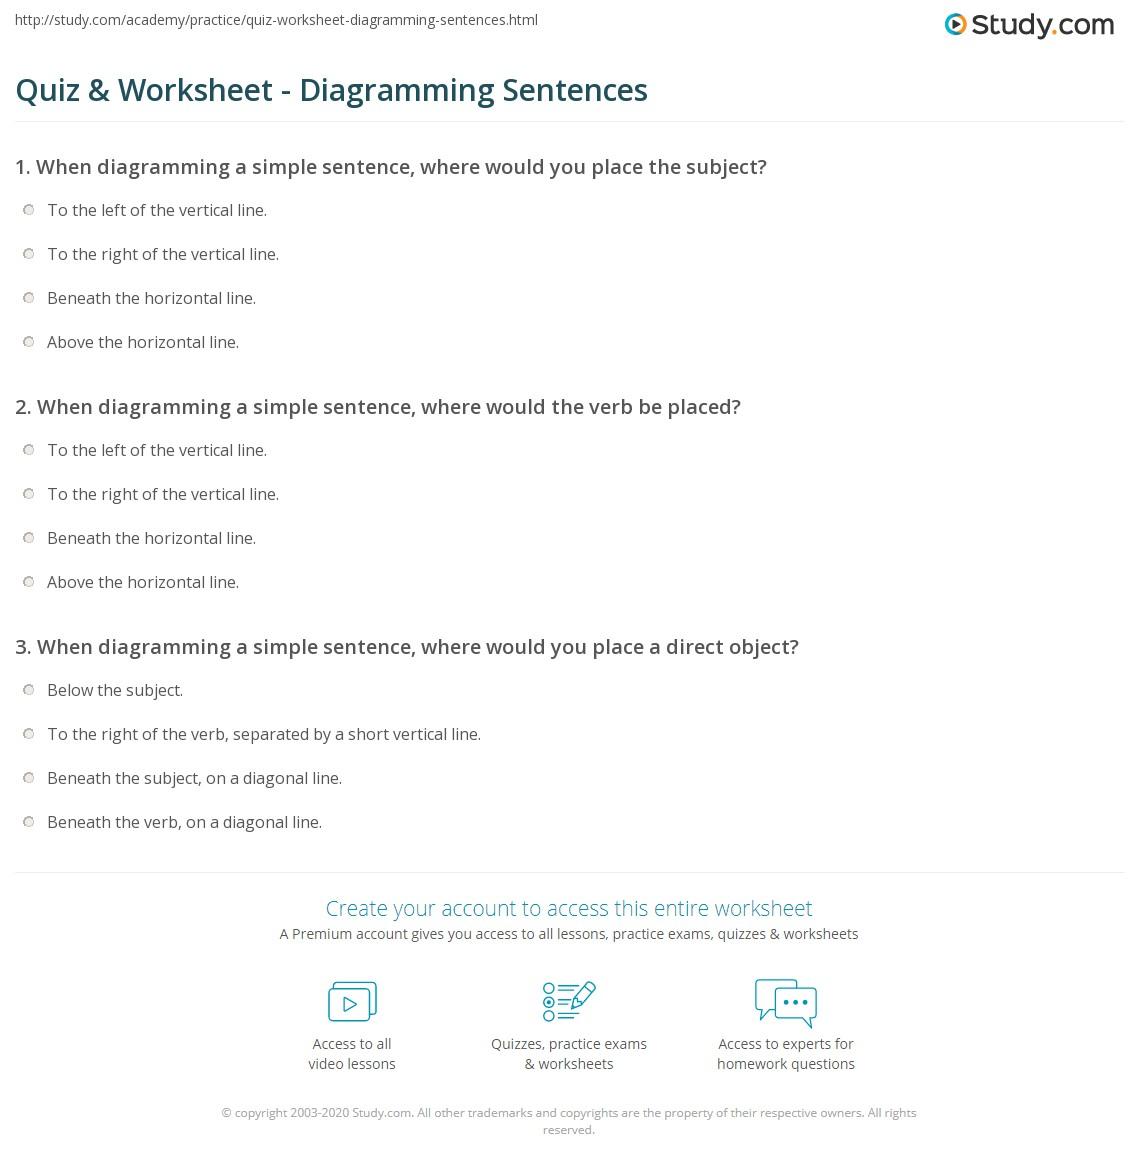 Quiz W Ksheet Di Gr Mm G Sentences Study